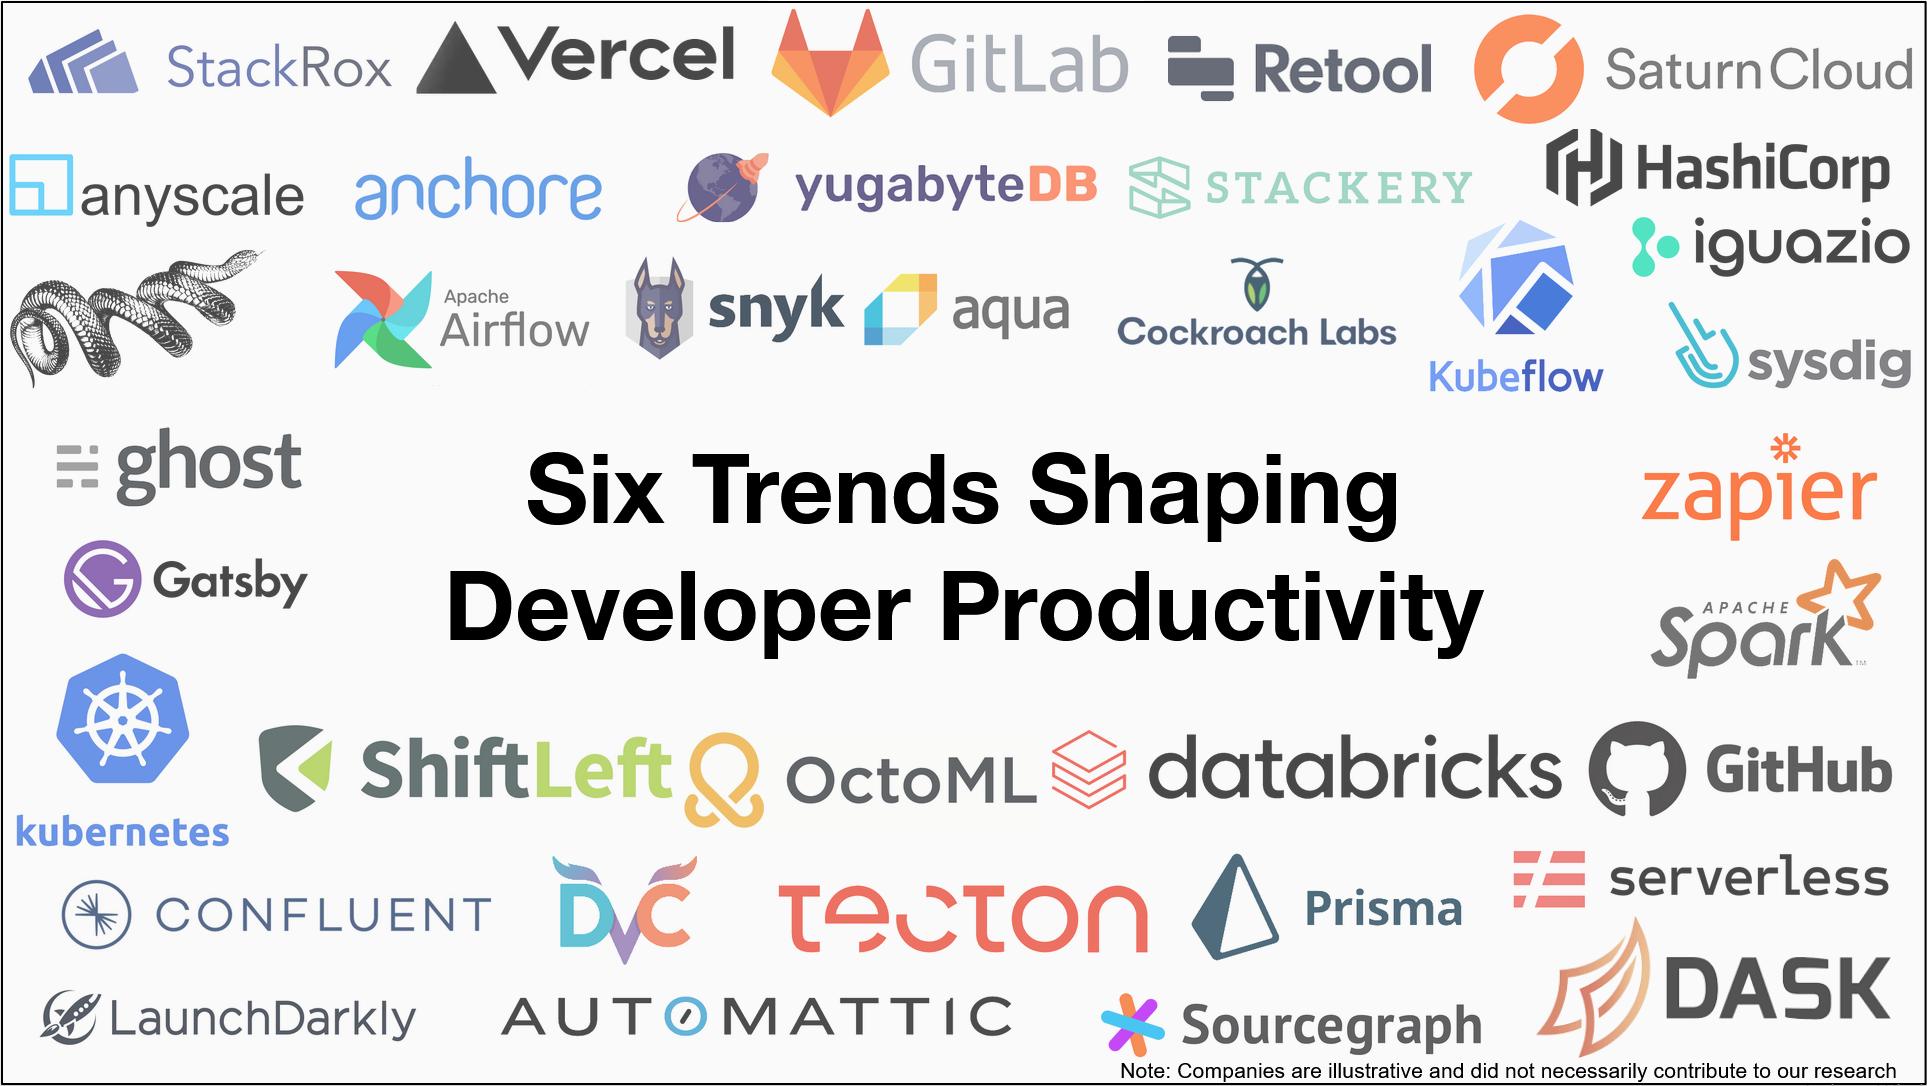 Six Trends Shaping Developer Productivity